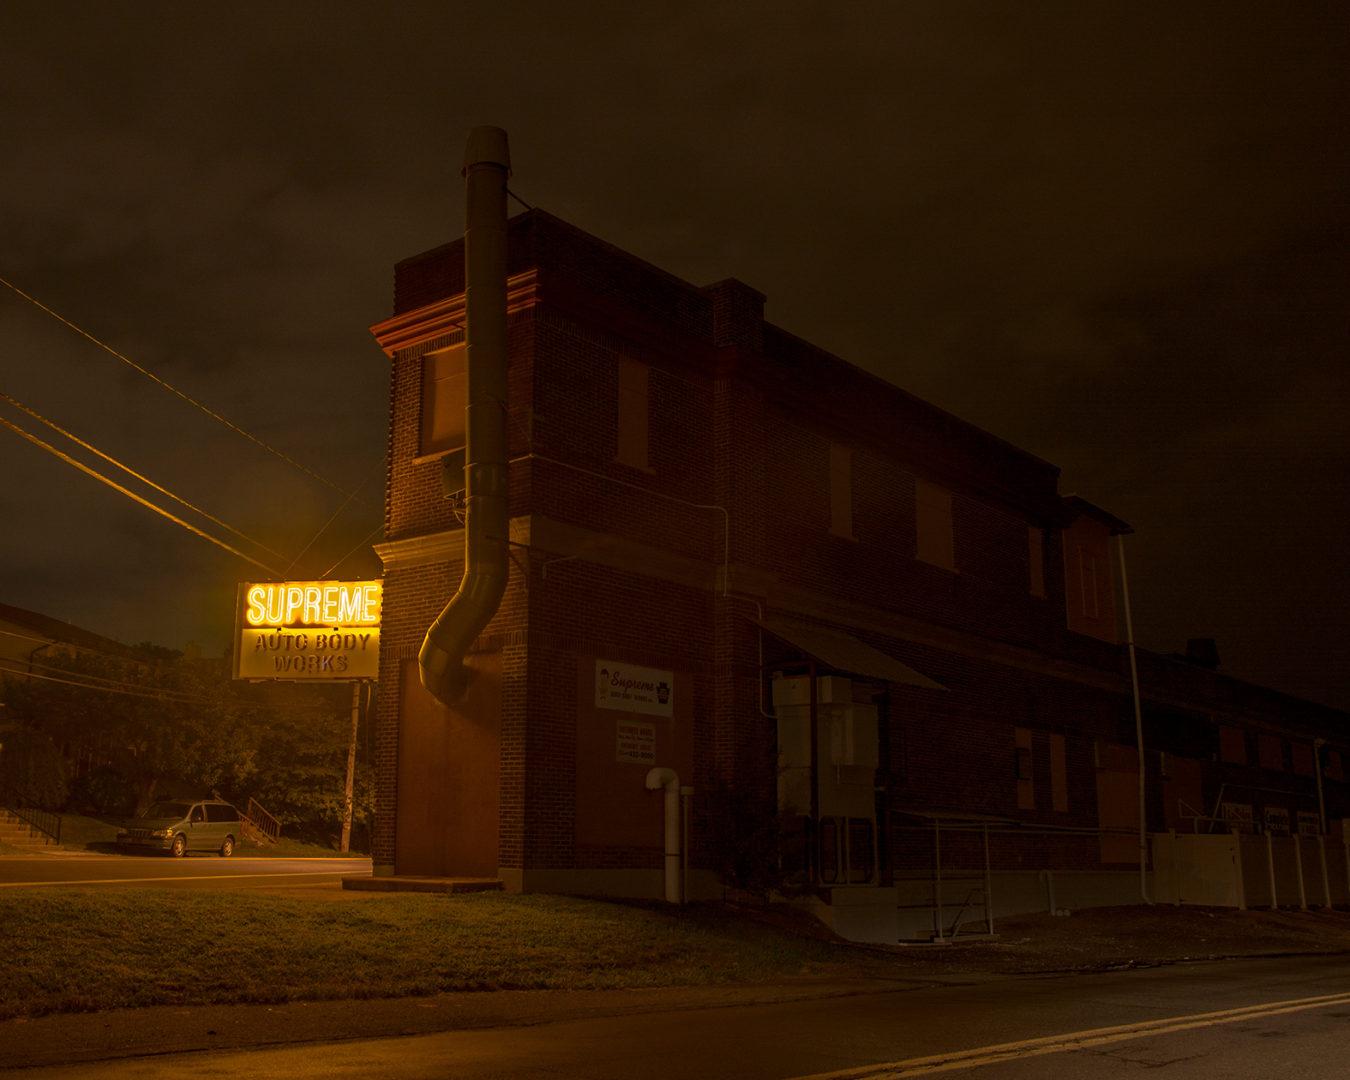 A body shop in Allentown